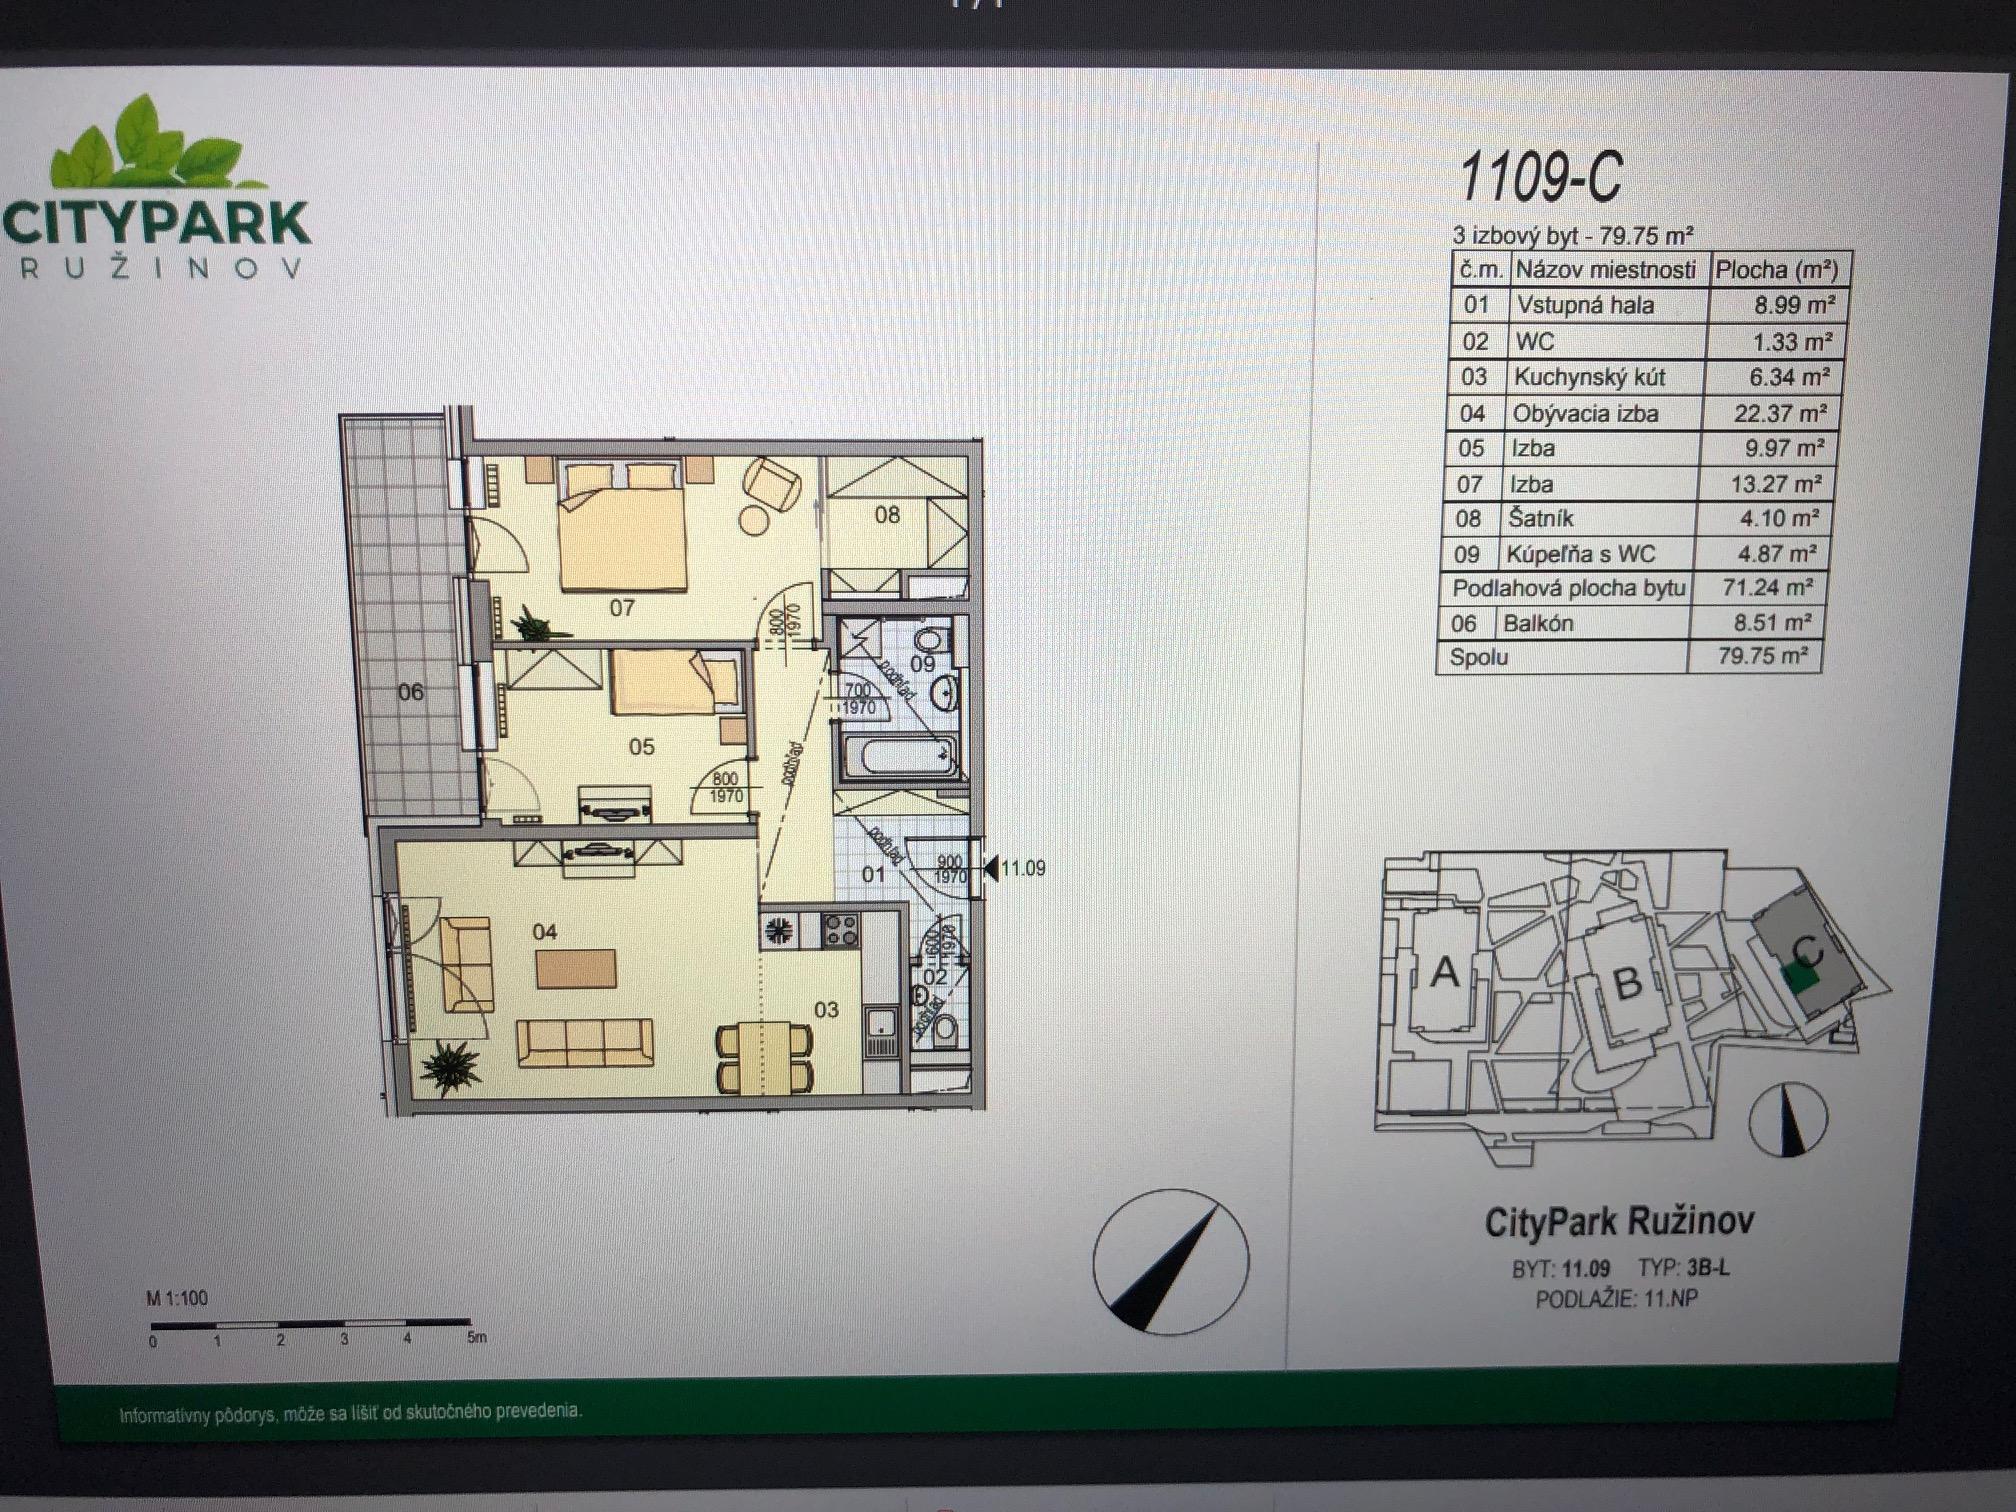 Predané: Exkluzívny 3- izbový byt v NOVOSTAVBE BA-NIVY, City Park, 71,24m2, balkón 8,5m2-28